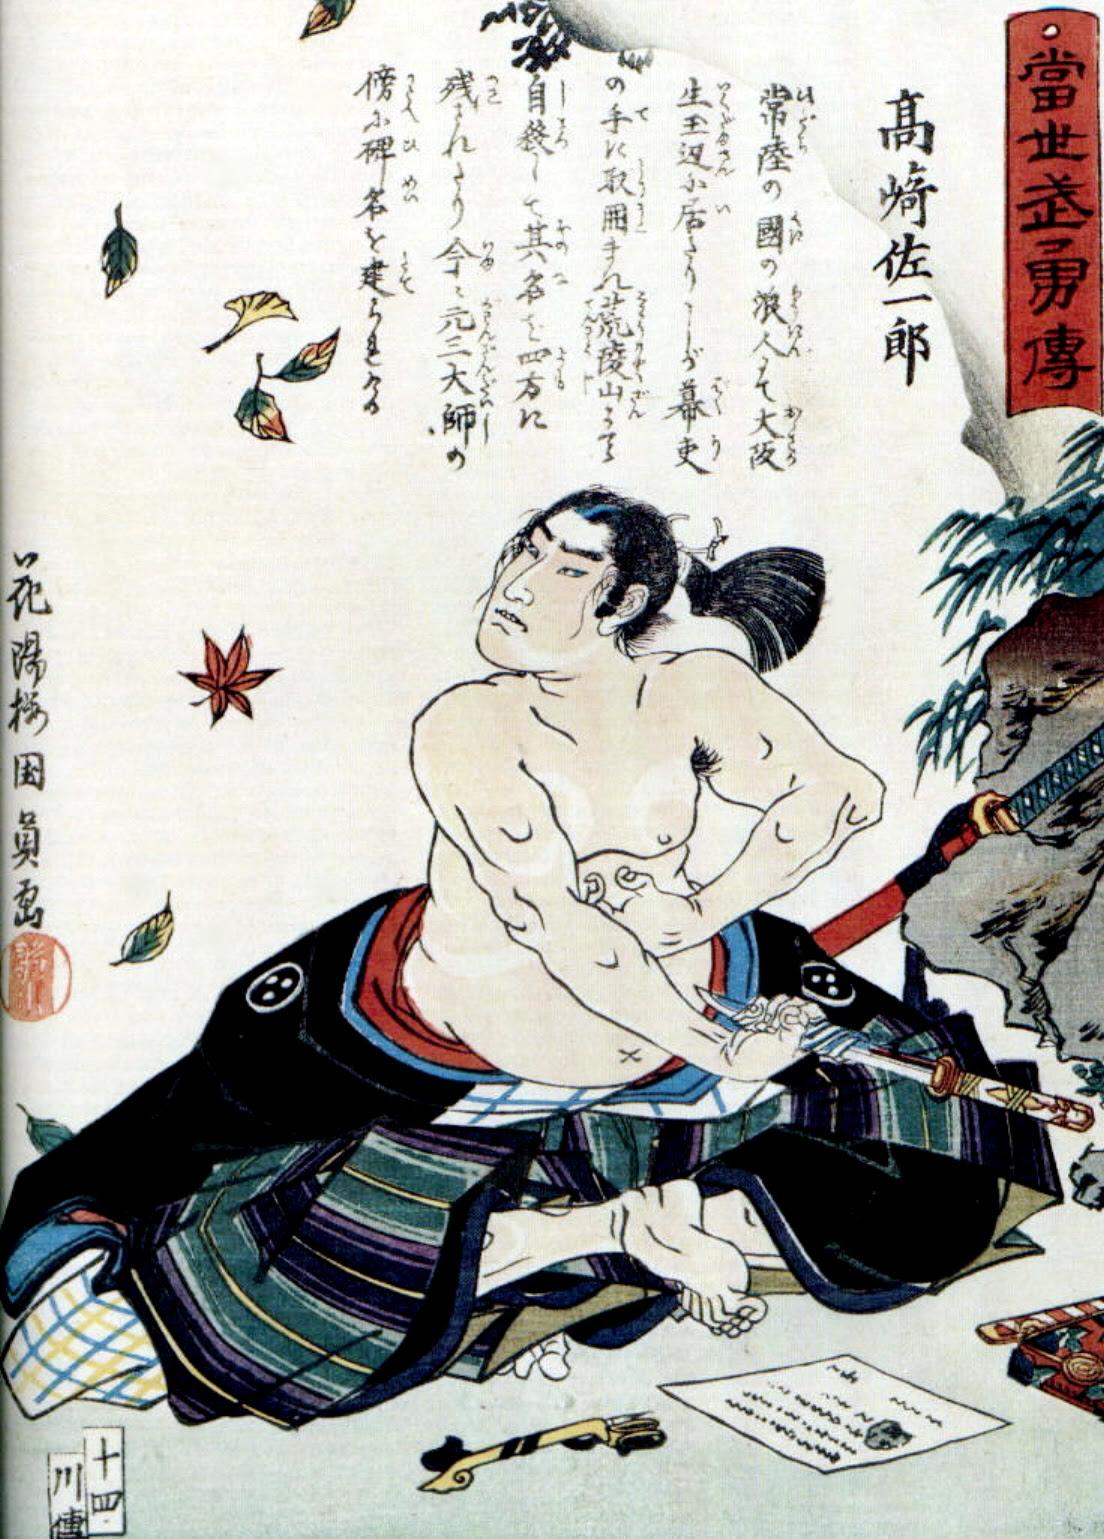 http://upload.wikimedia.org/wikipedia/commons/e/ec/Seppuku-2.jpg